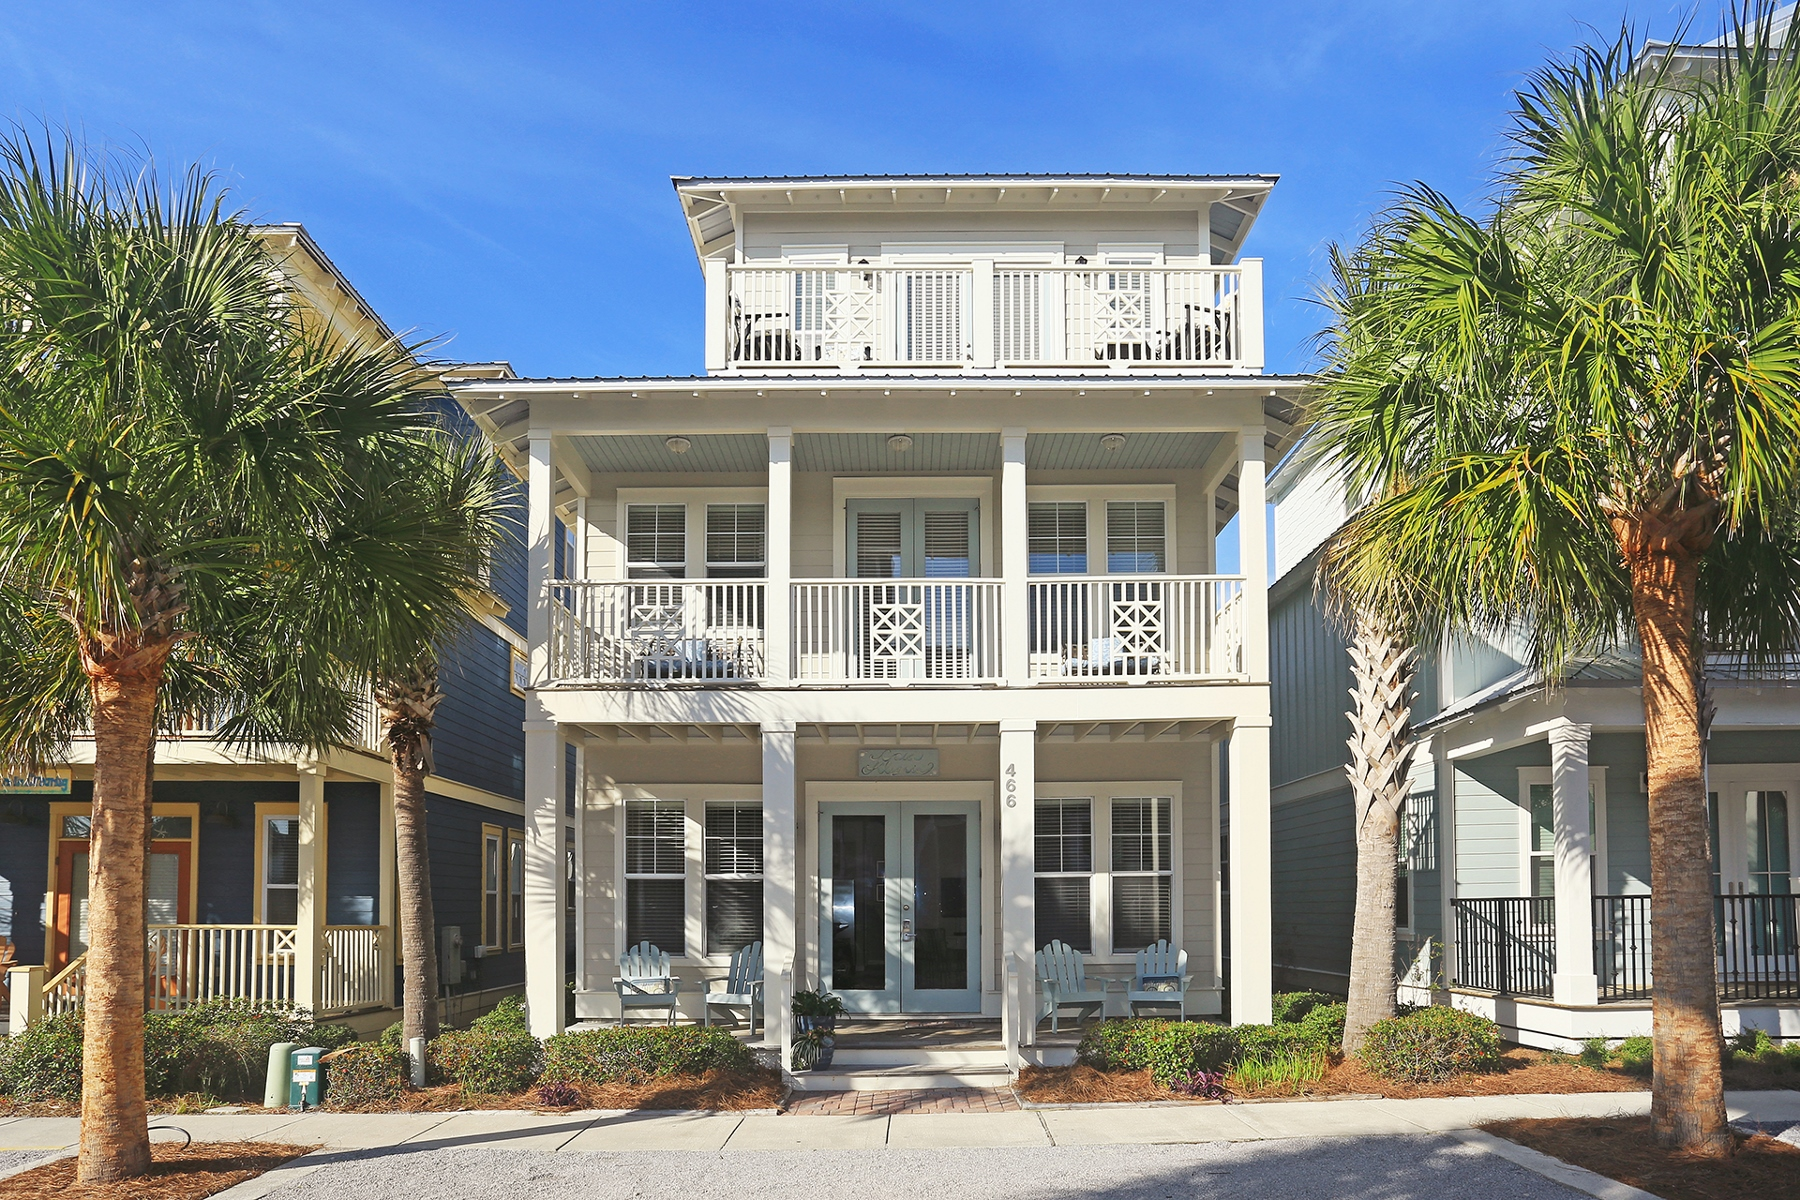 Villa per Vendita alle ore INVESTMENT & VACATION PROPERTY FULLY FURNISHED 466 Beach Bike Way Inlet Beach, Florida, 32461 Stati Uniti